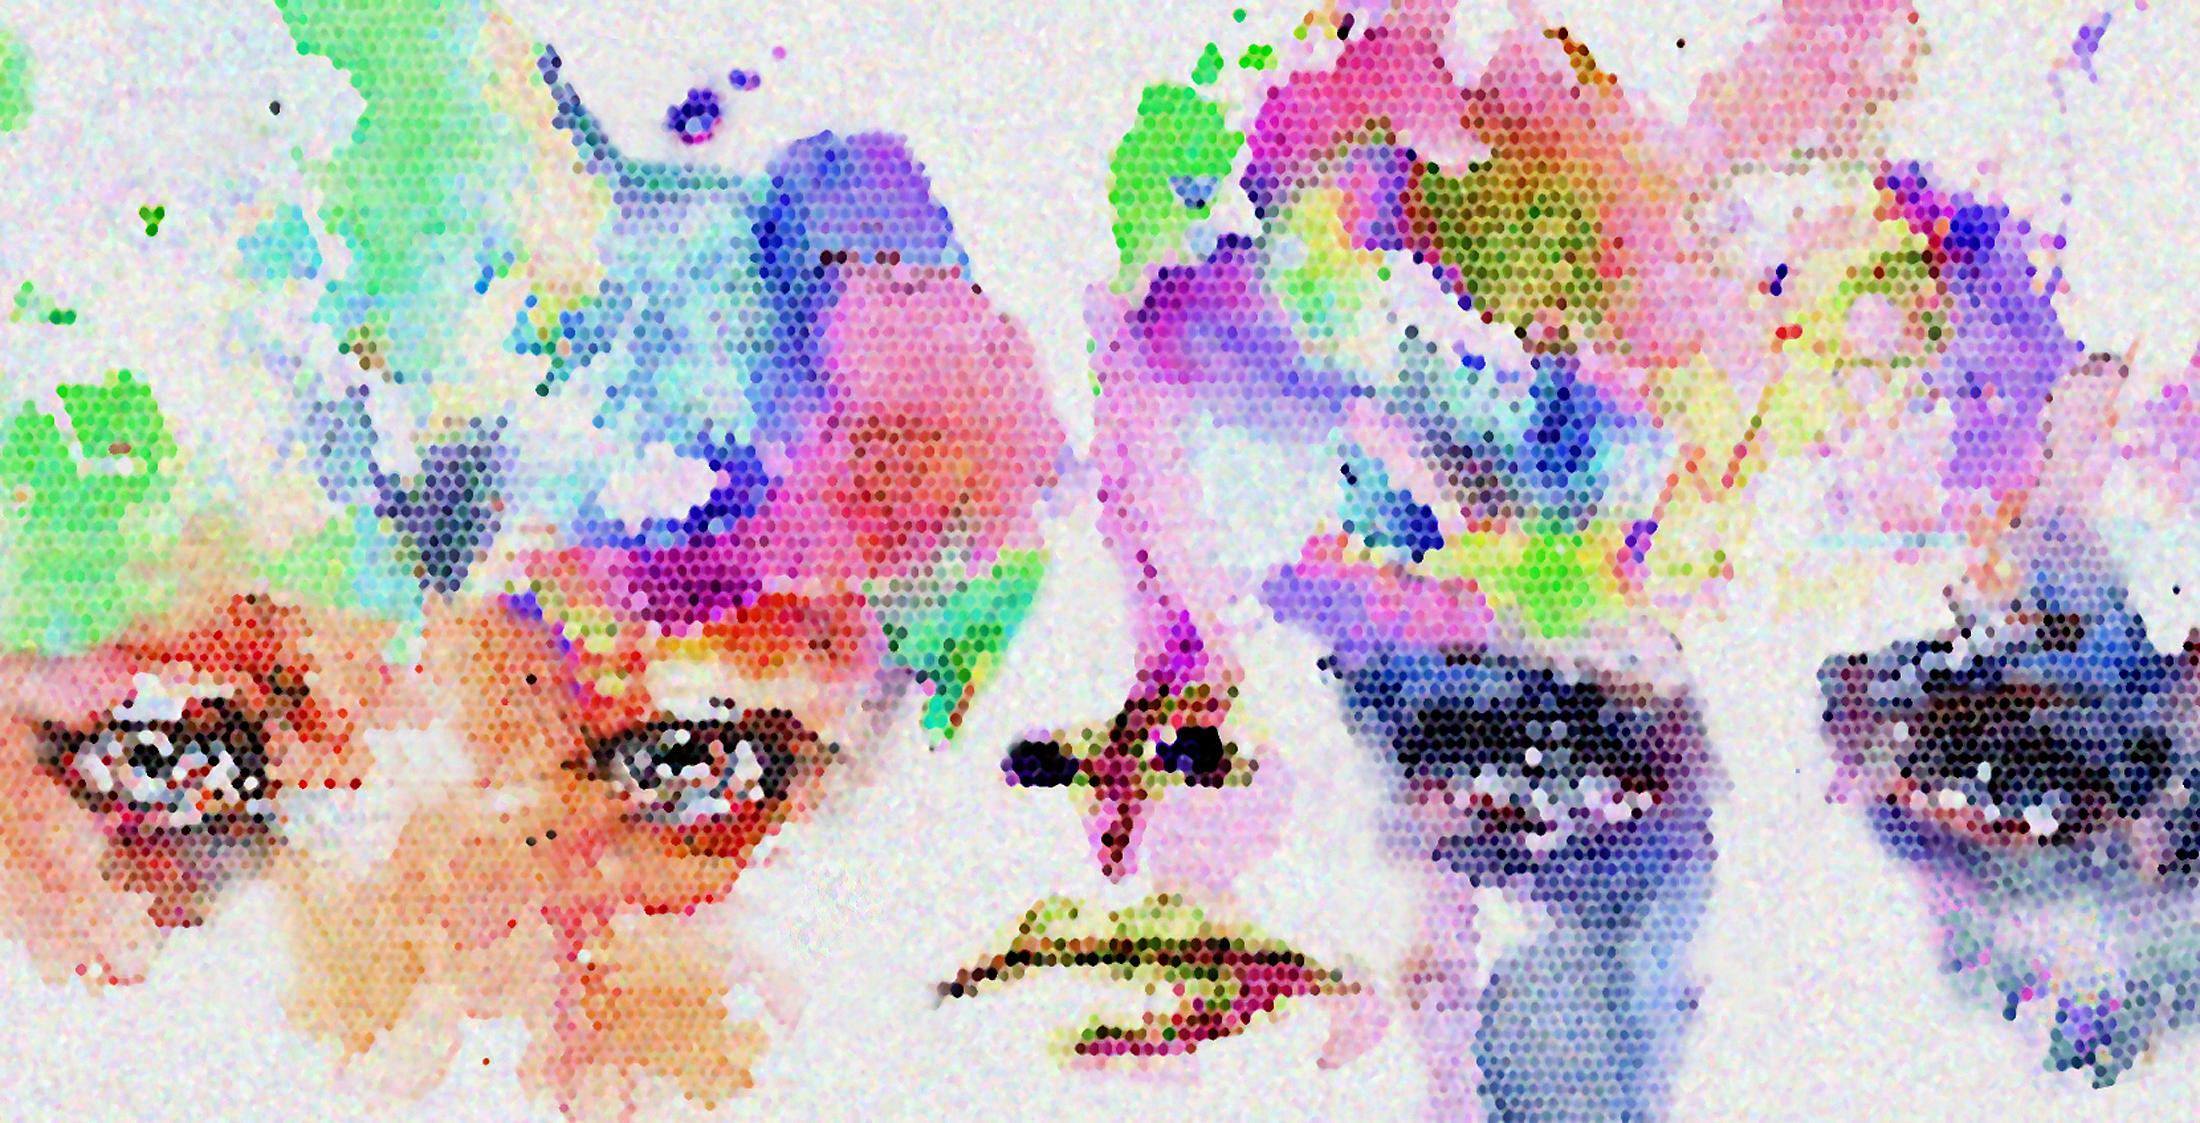 Illustration by Olivia Baenziger